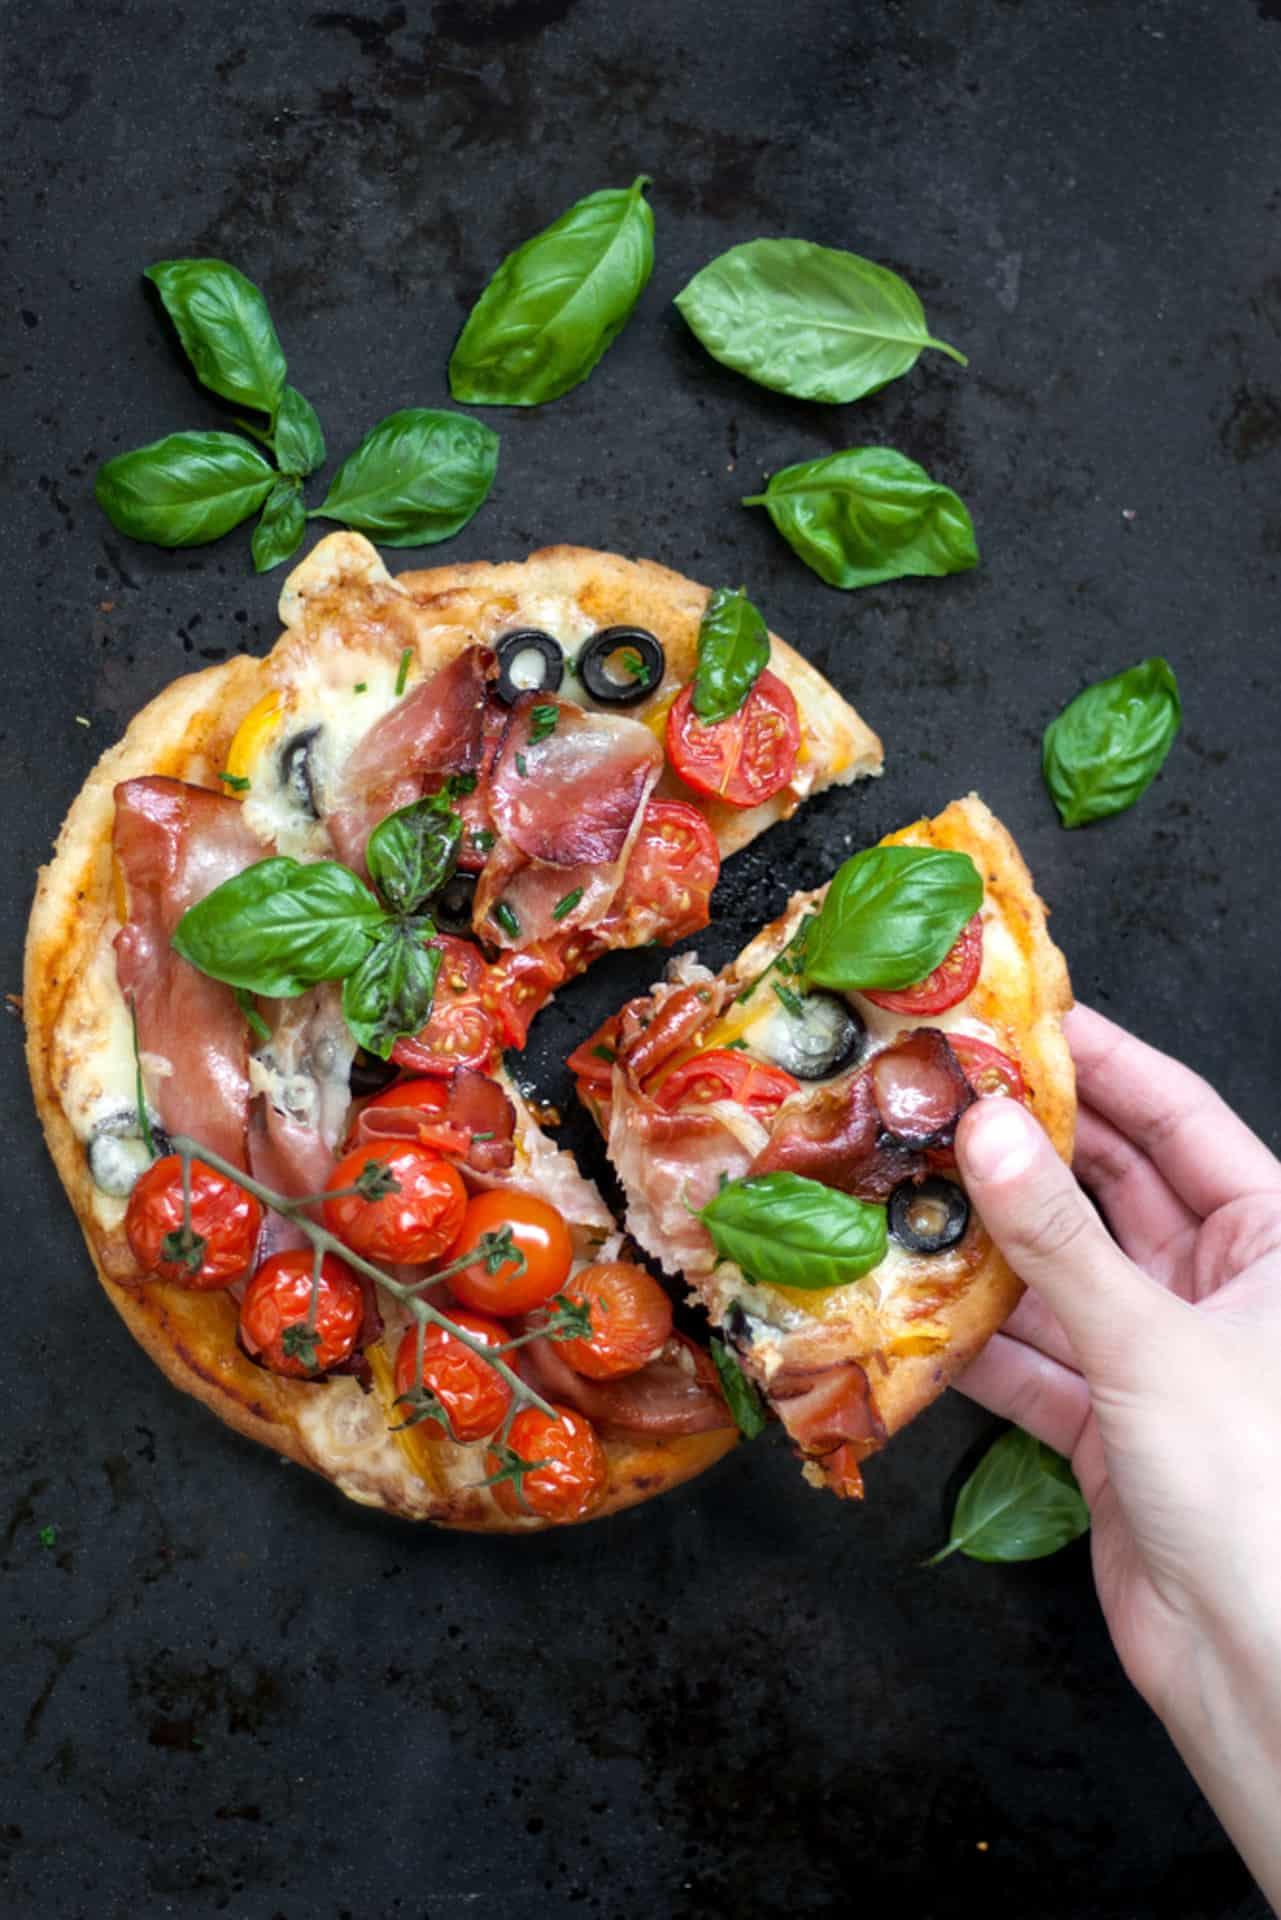 Gluten Free Yeast Free Pizza.